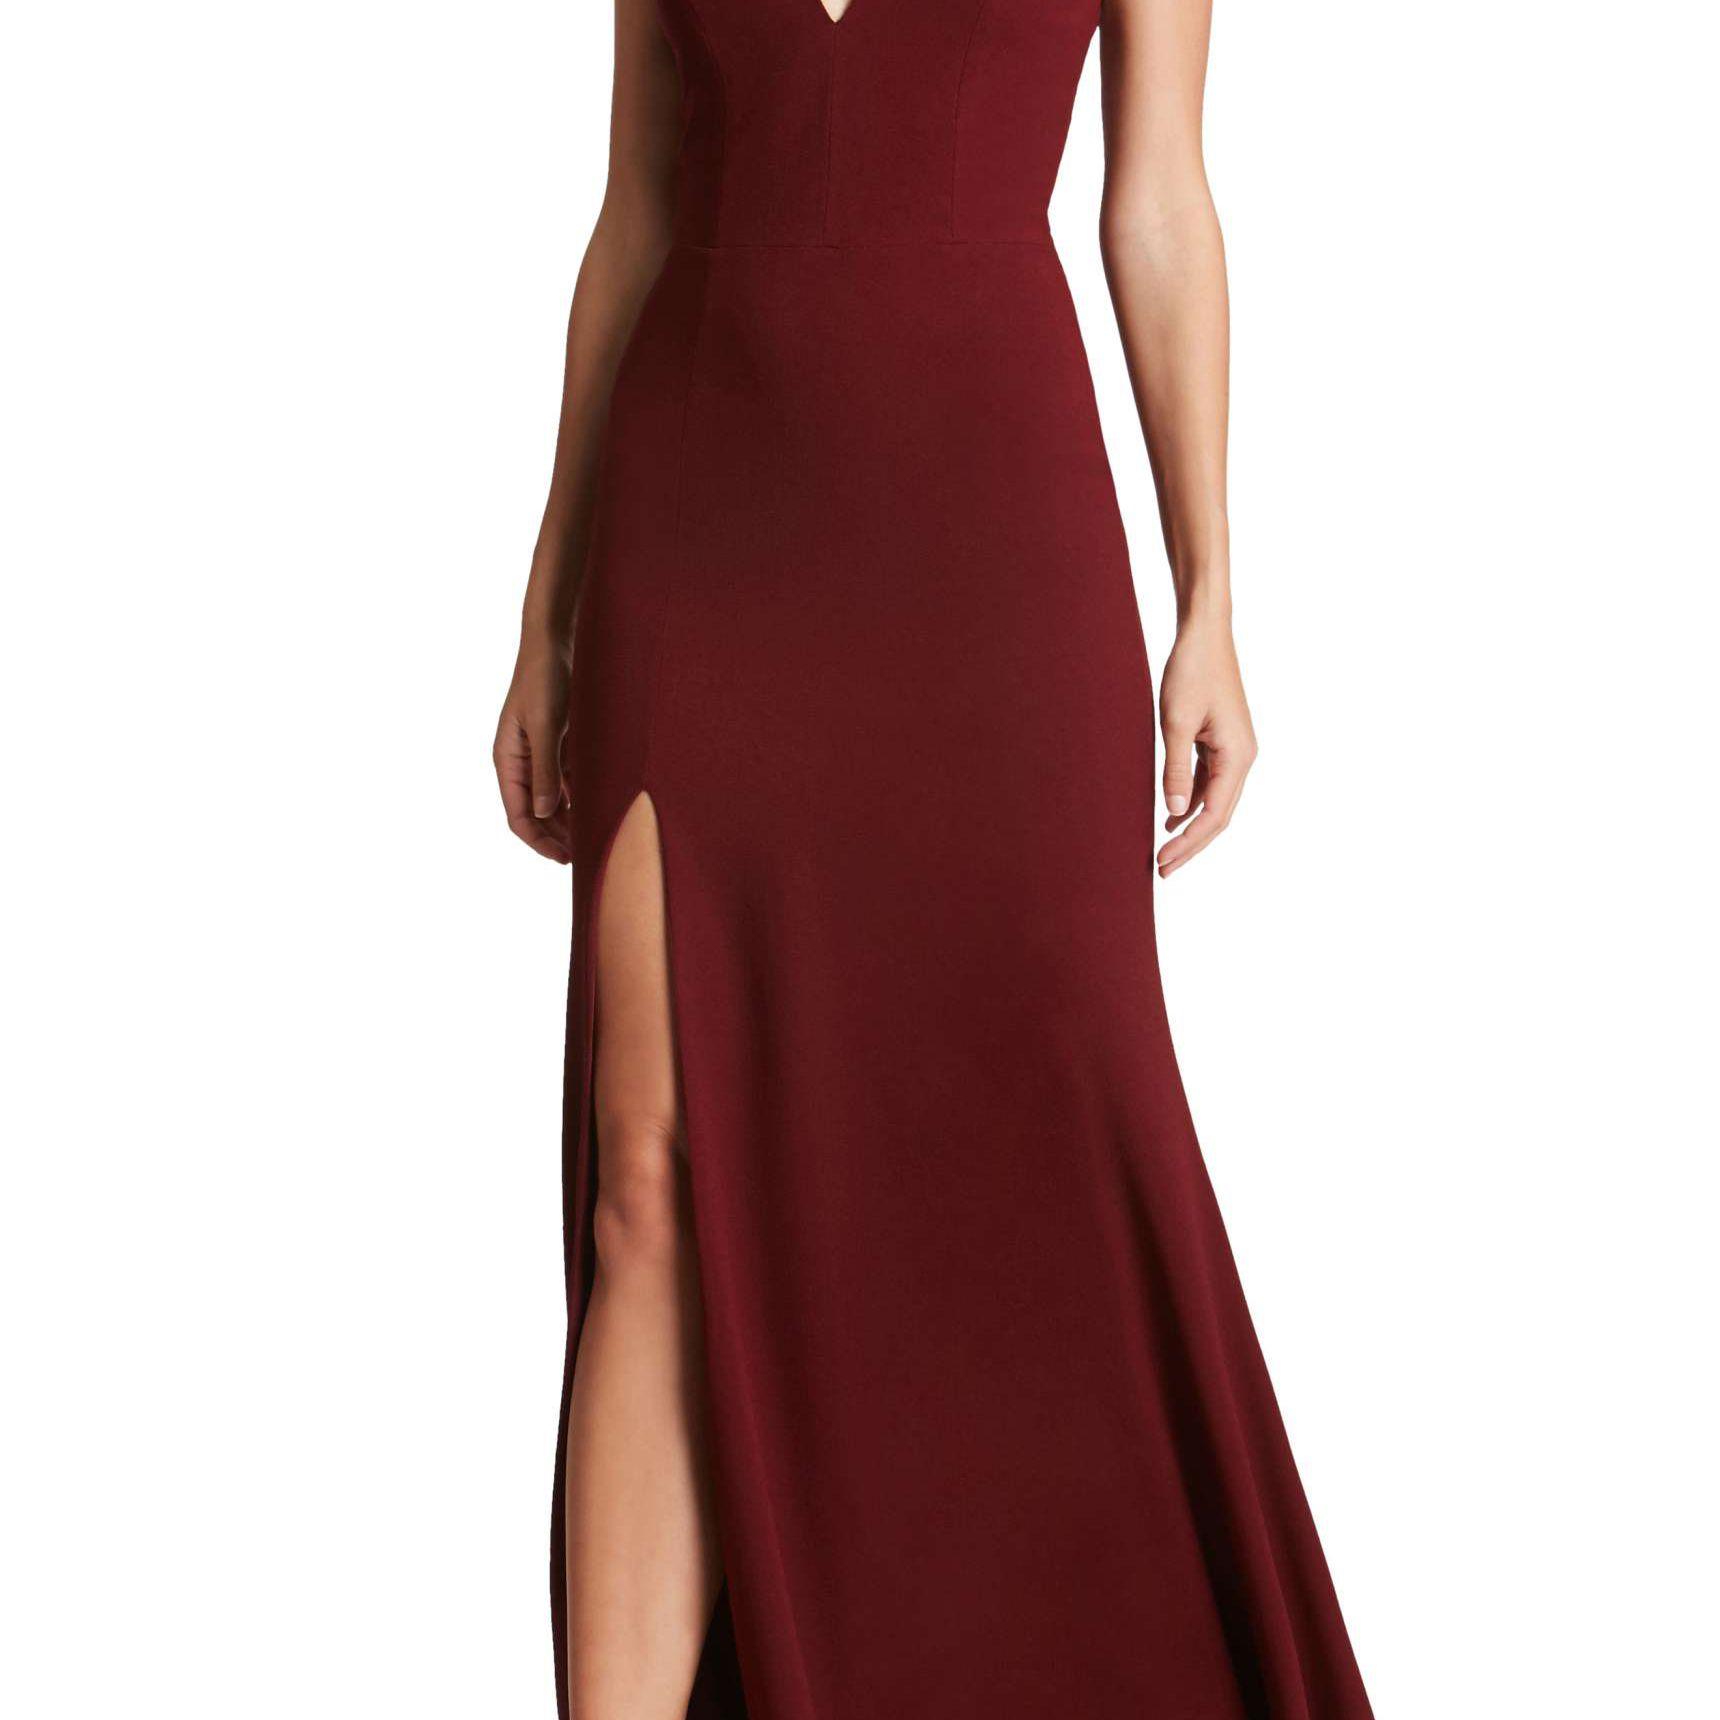 23 Burgundy Bridesmaid Dresses Perfect For A Fall Wedding